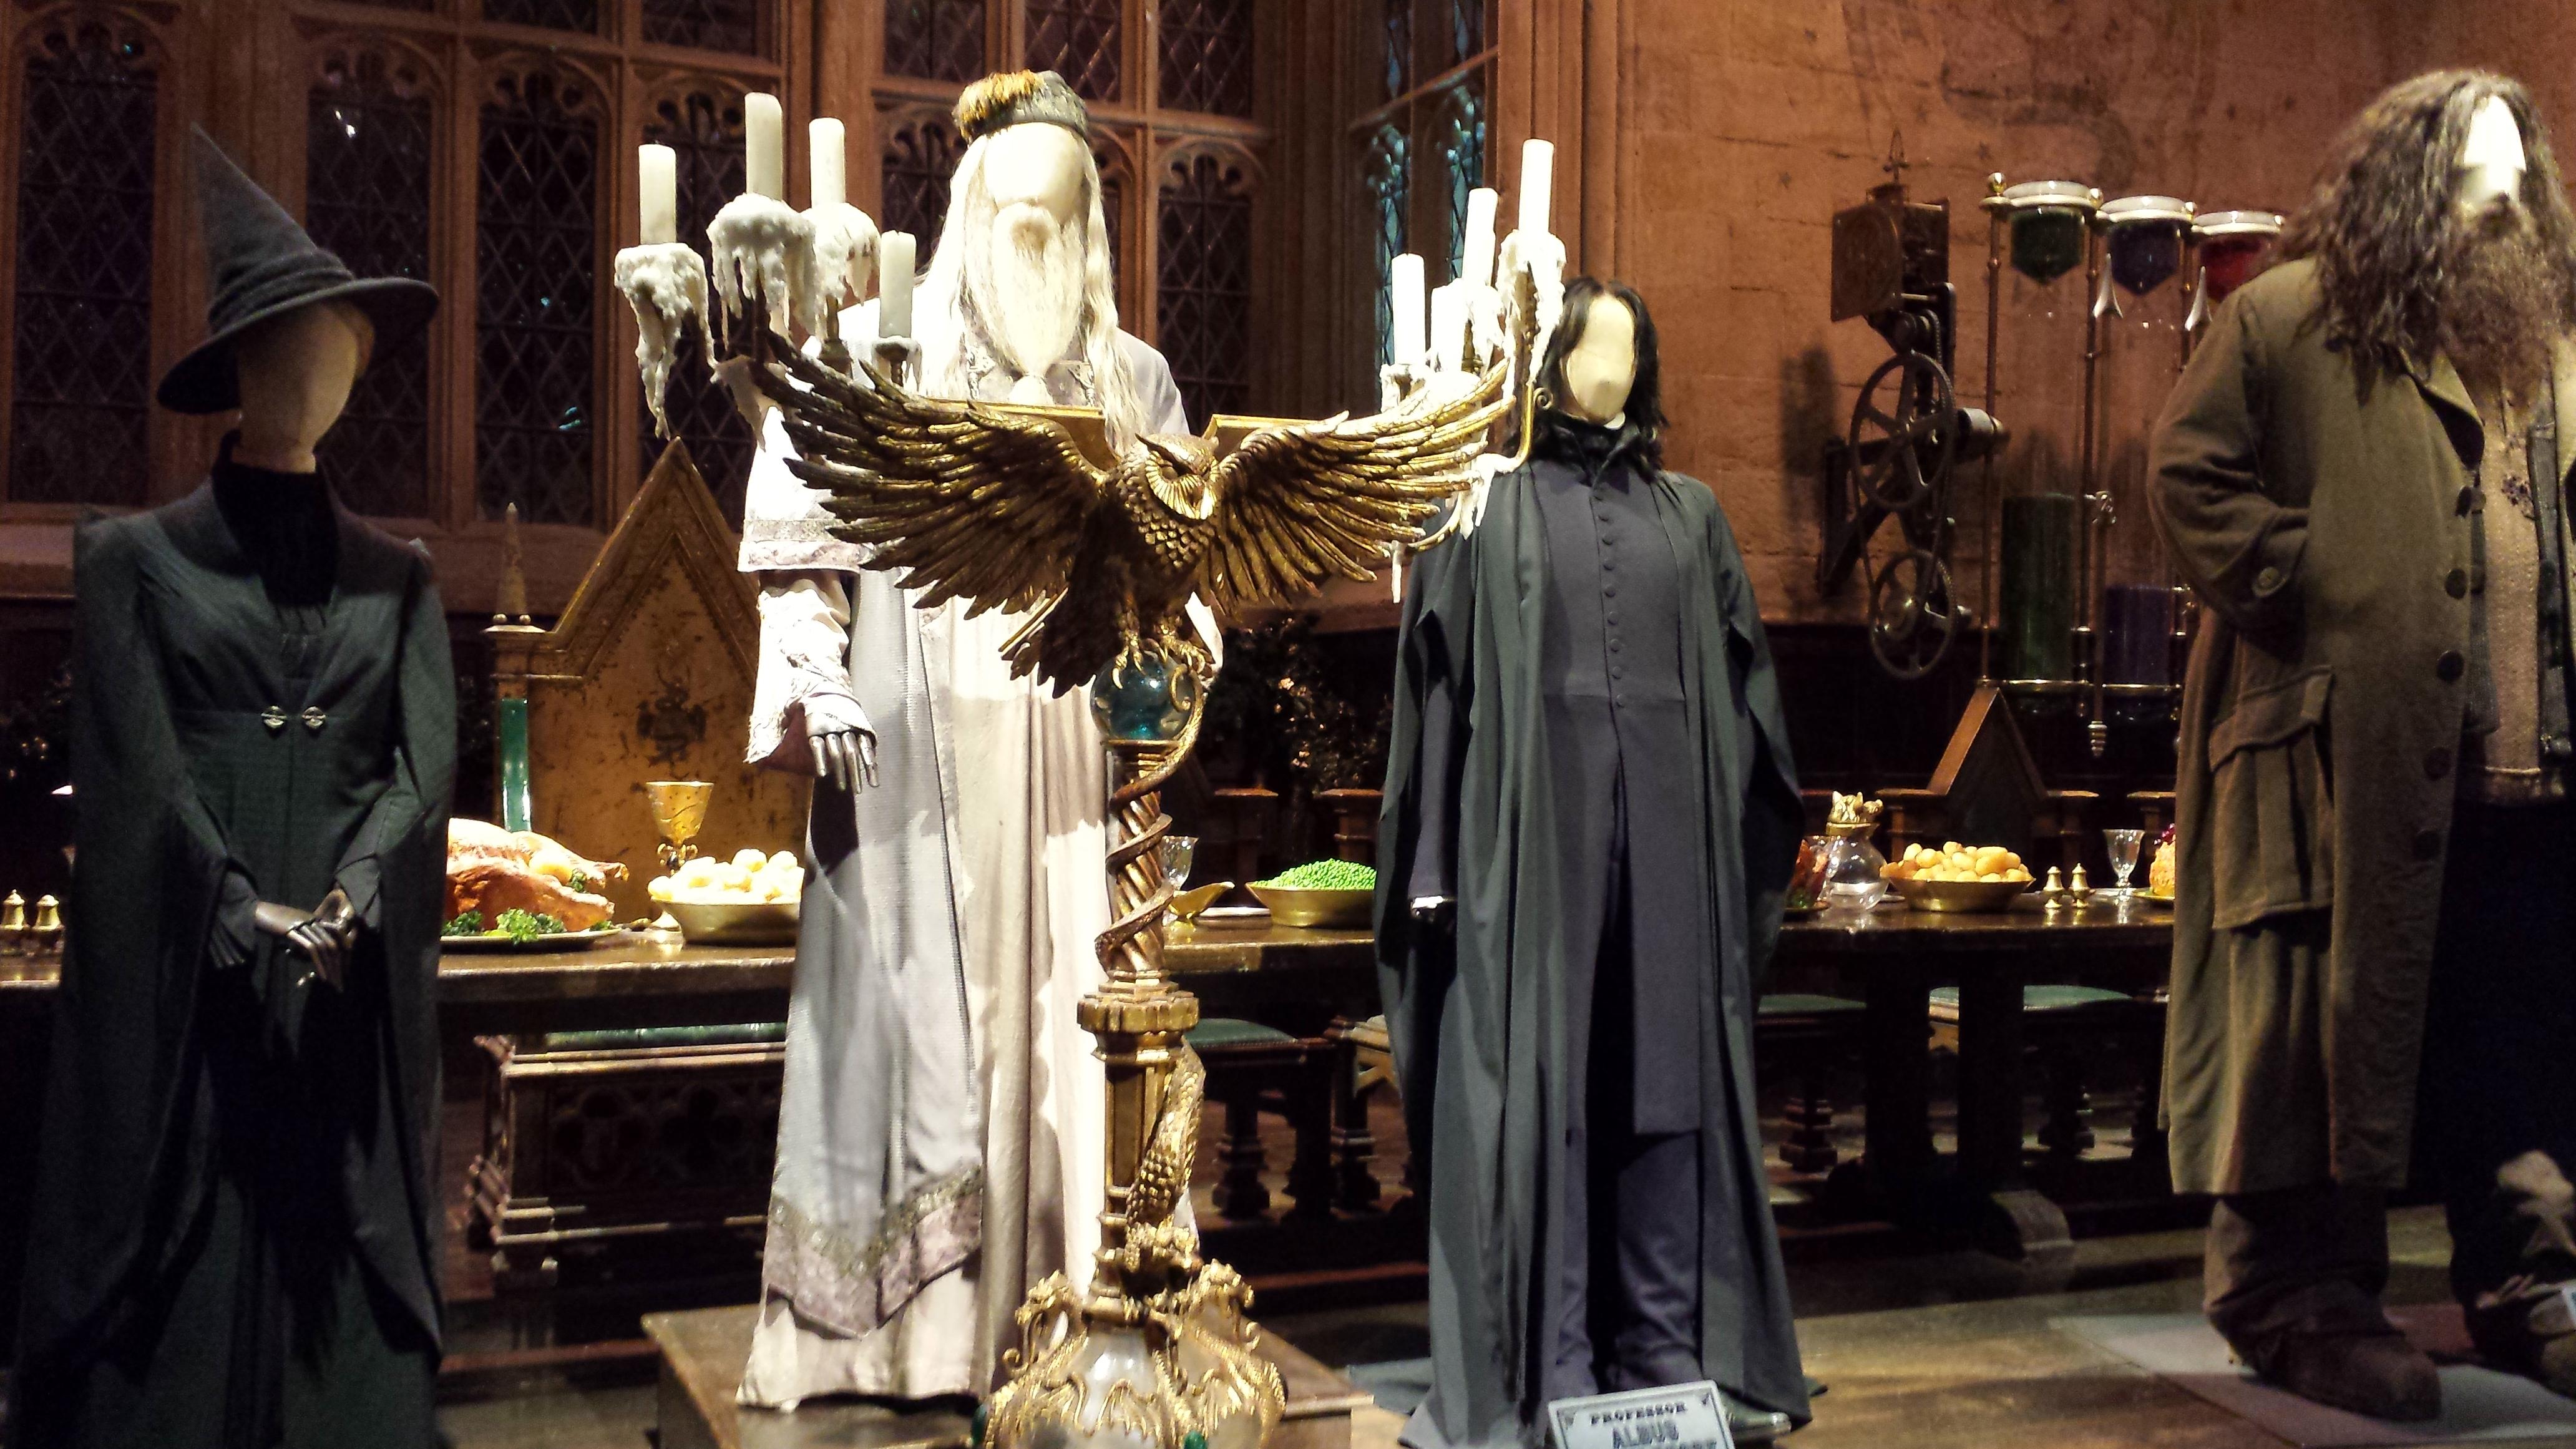 Harry Potter Tour, London